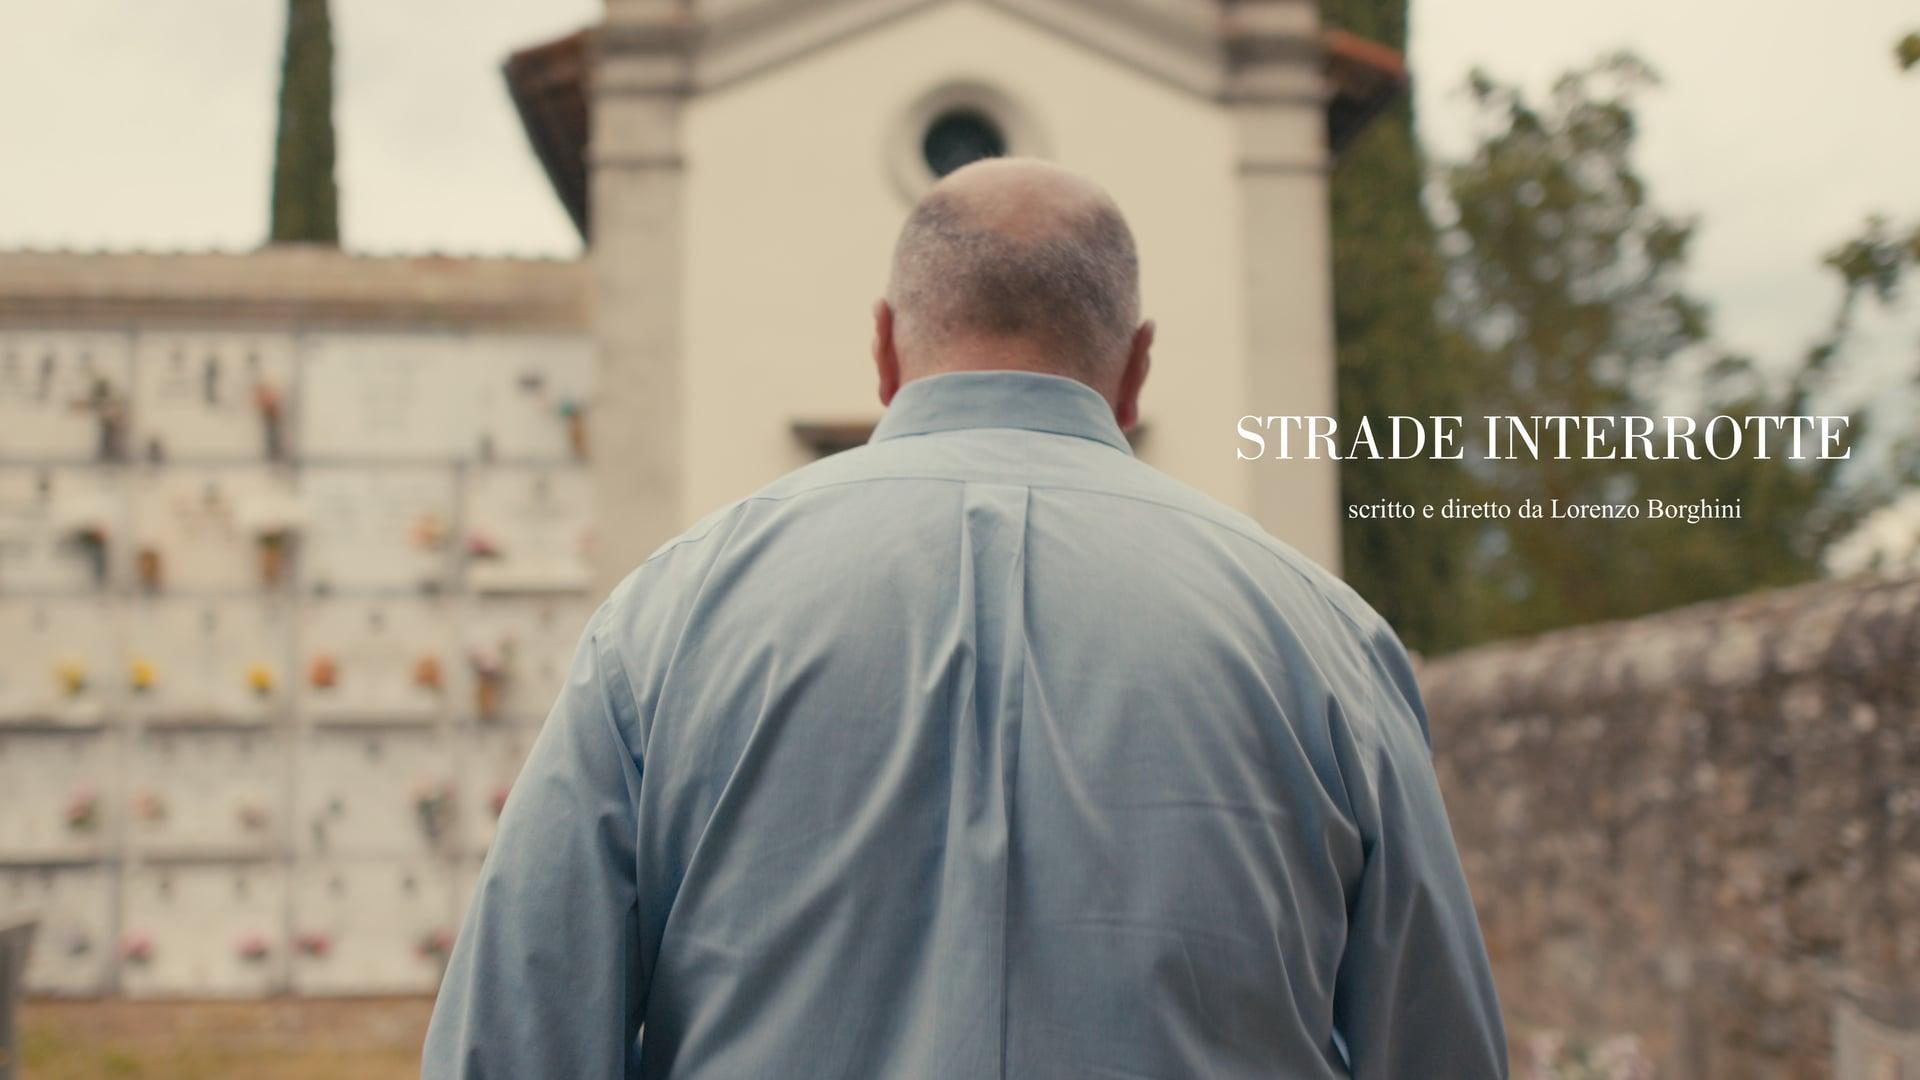 Strade interrotte - Teaser